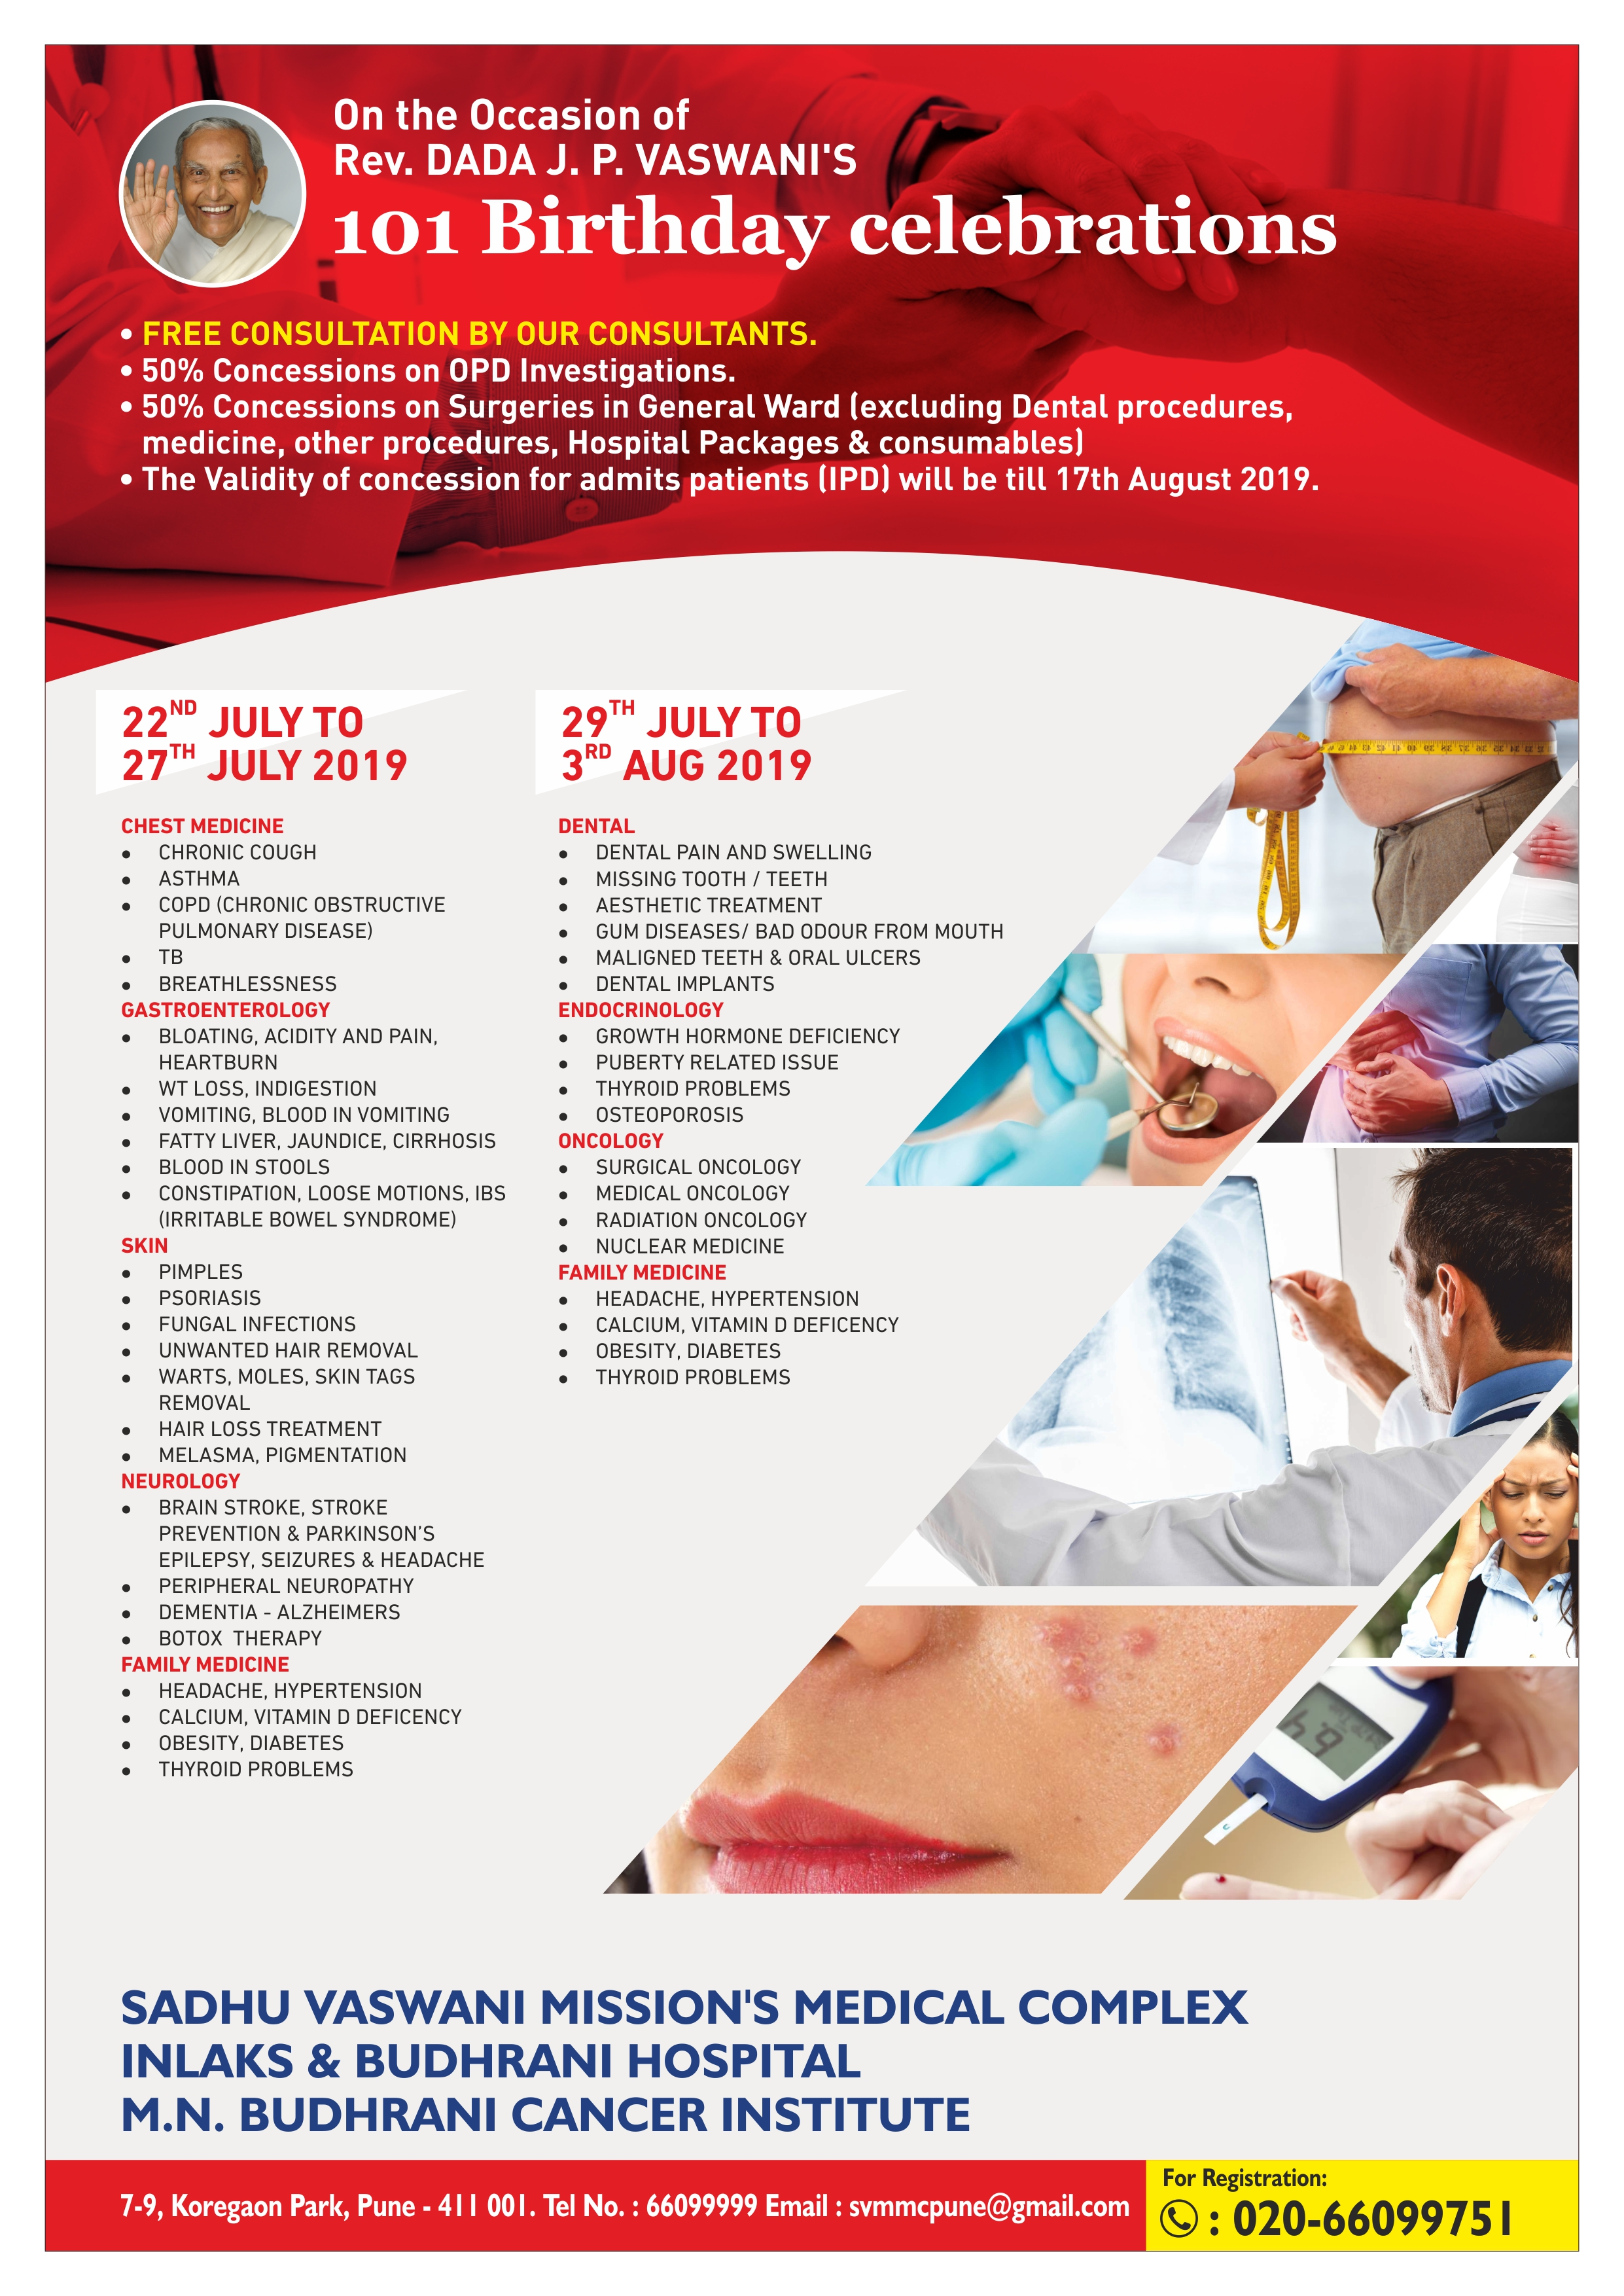 Inlaks & budhrani Hospital